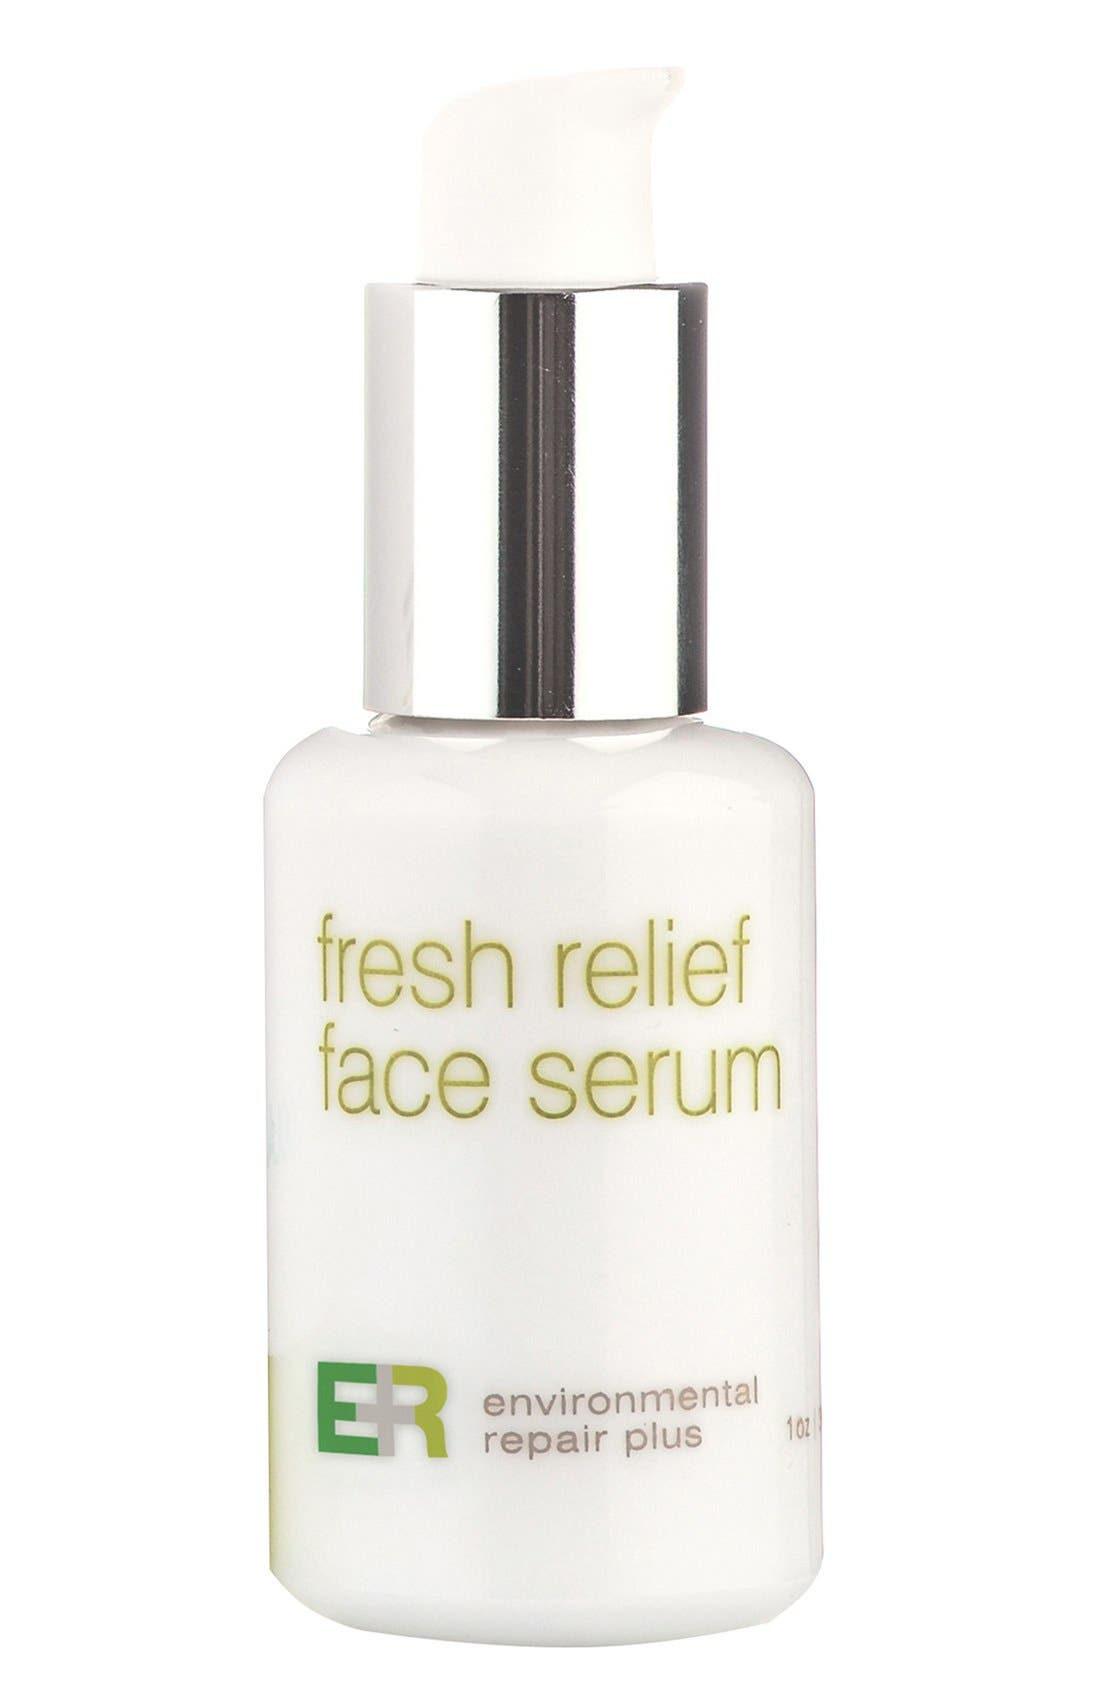 COOLA® Suncare Environmental Repair Plus® Fresh Relief™ Face Serum